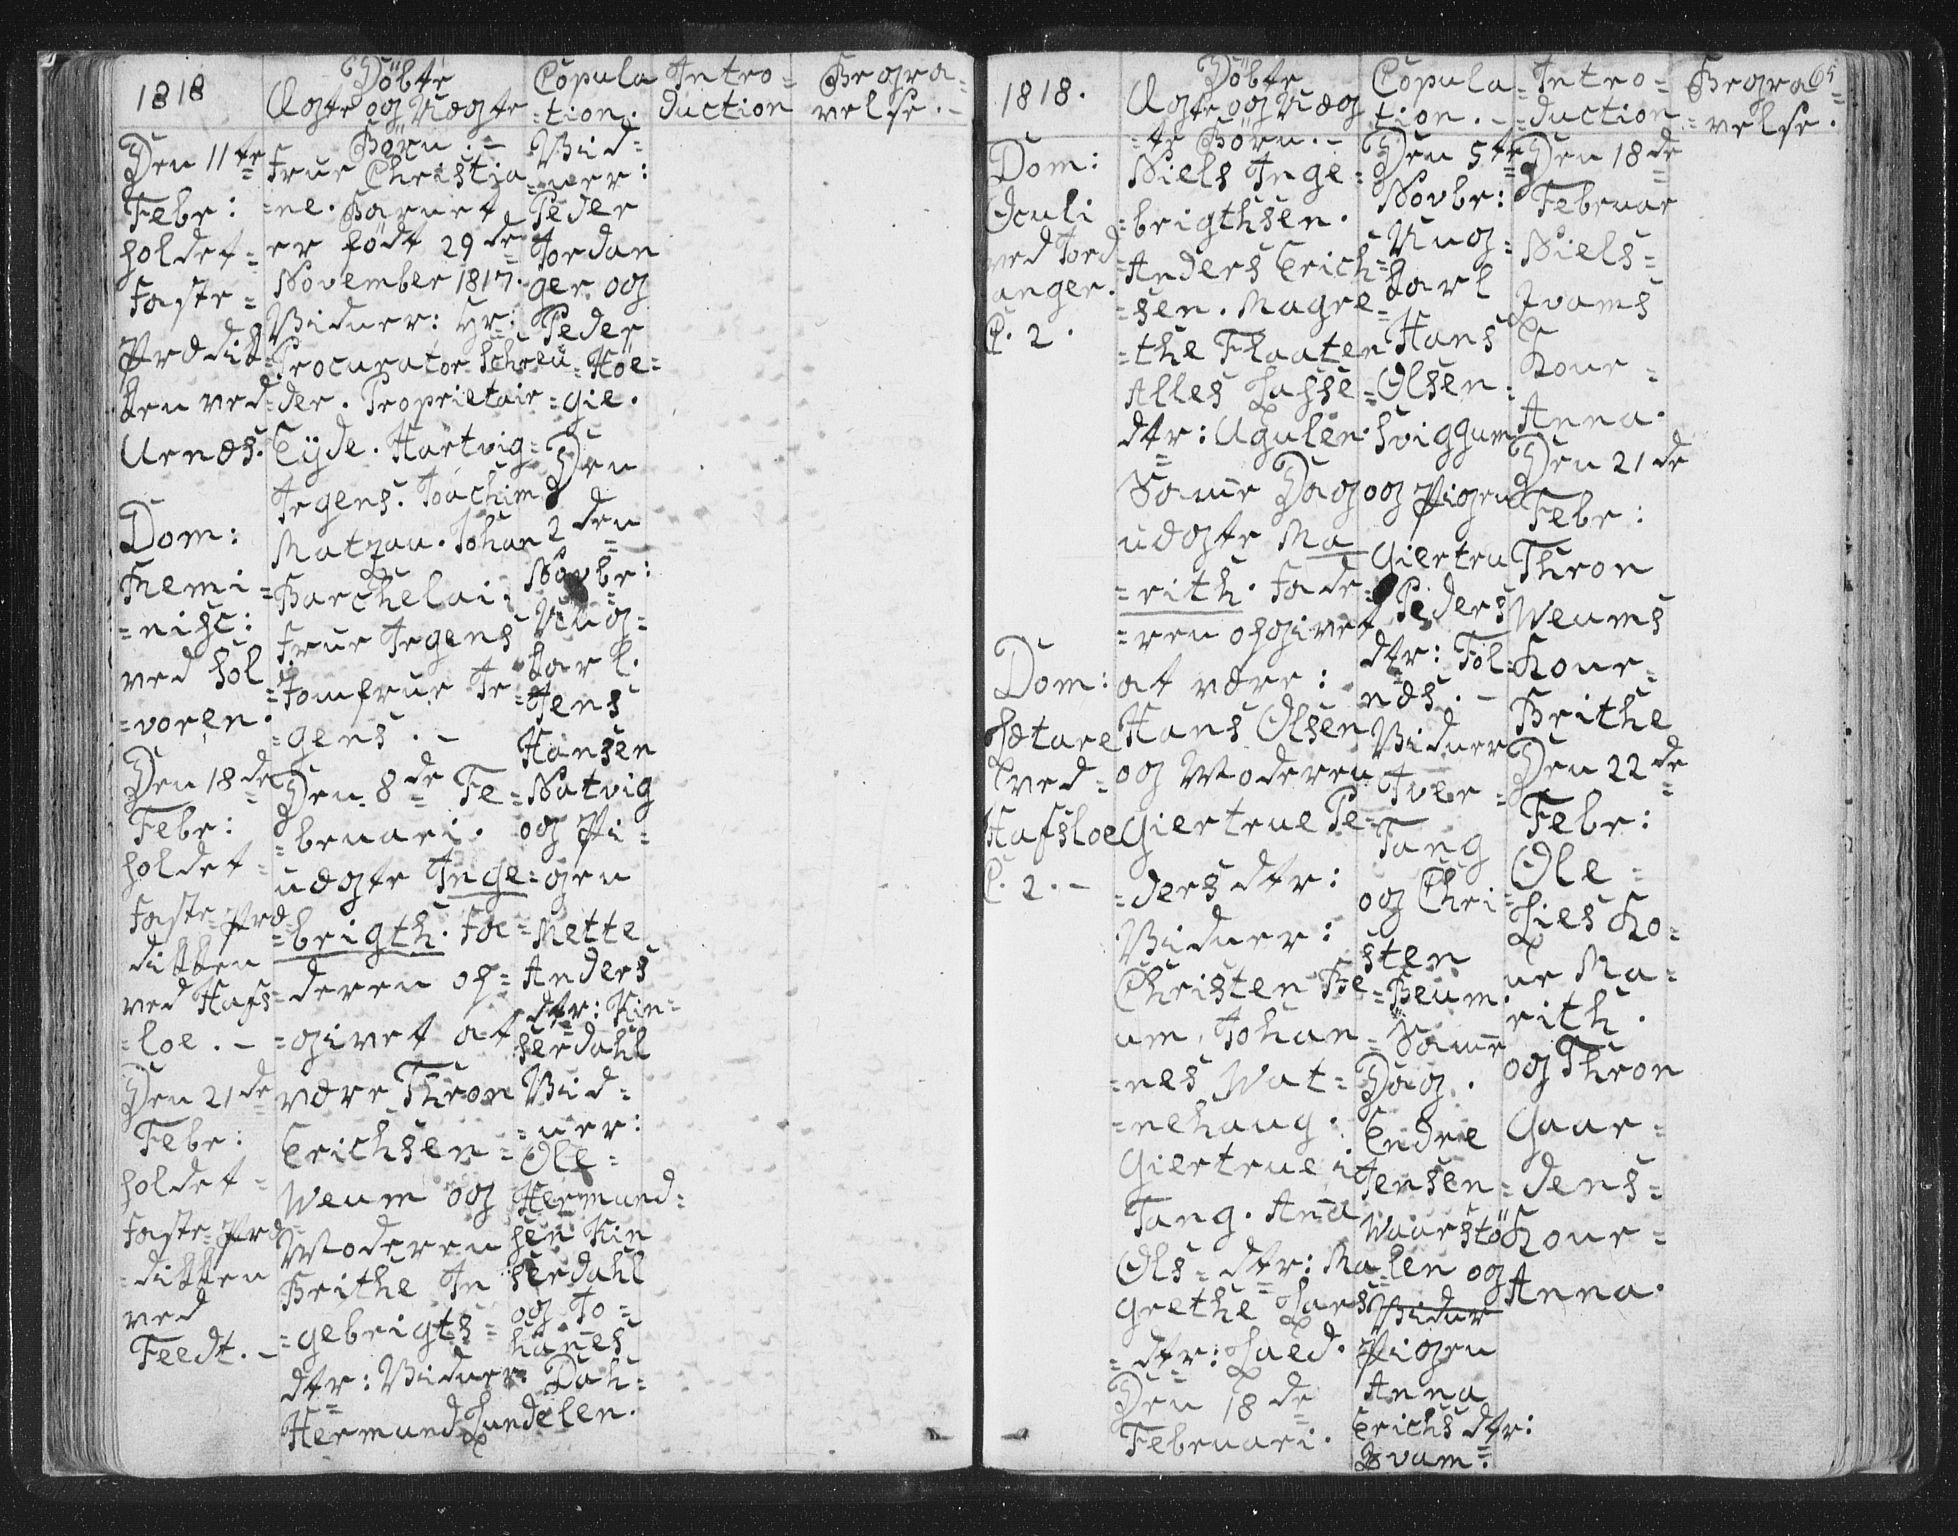 SAB, Hafslo sokneprestembete, H/Haa/Haaa/L0003: Ministerialbok nr. A 3, 1807-1821, s. 65